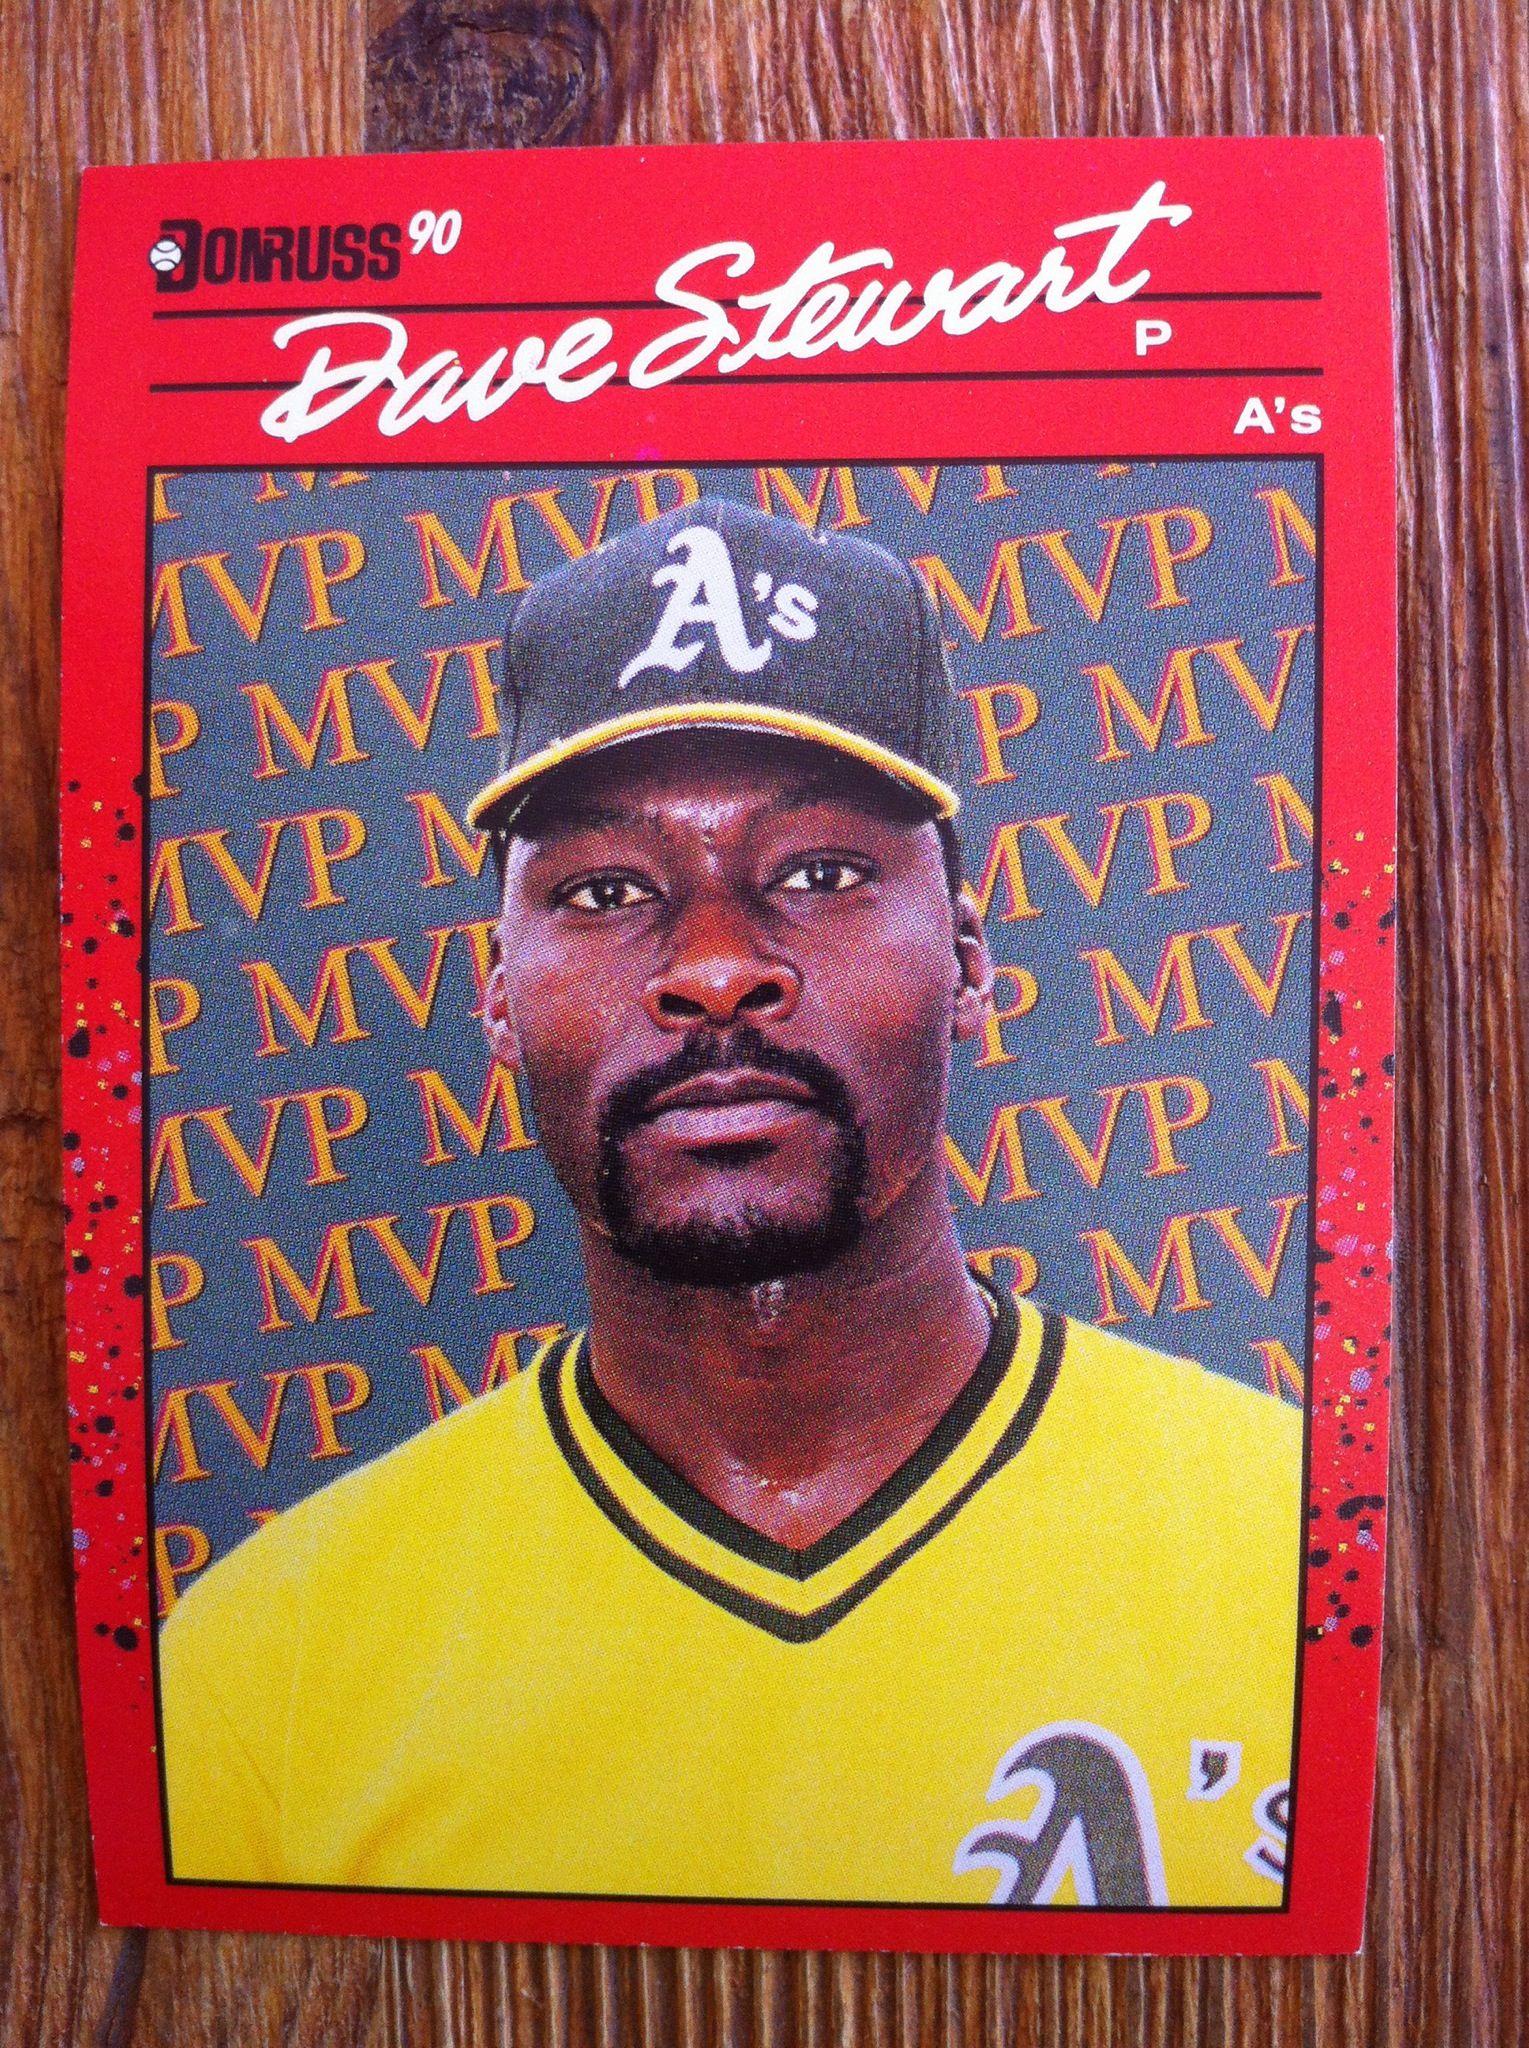 Dave Stewart Baseball Cards Old Baseball Cards Baseball